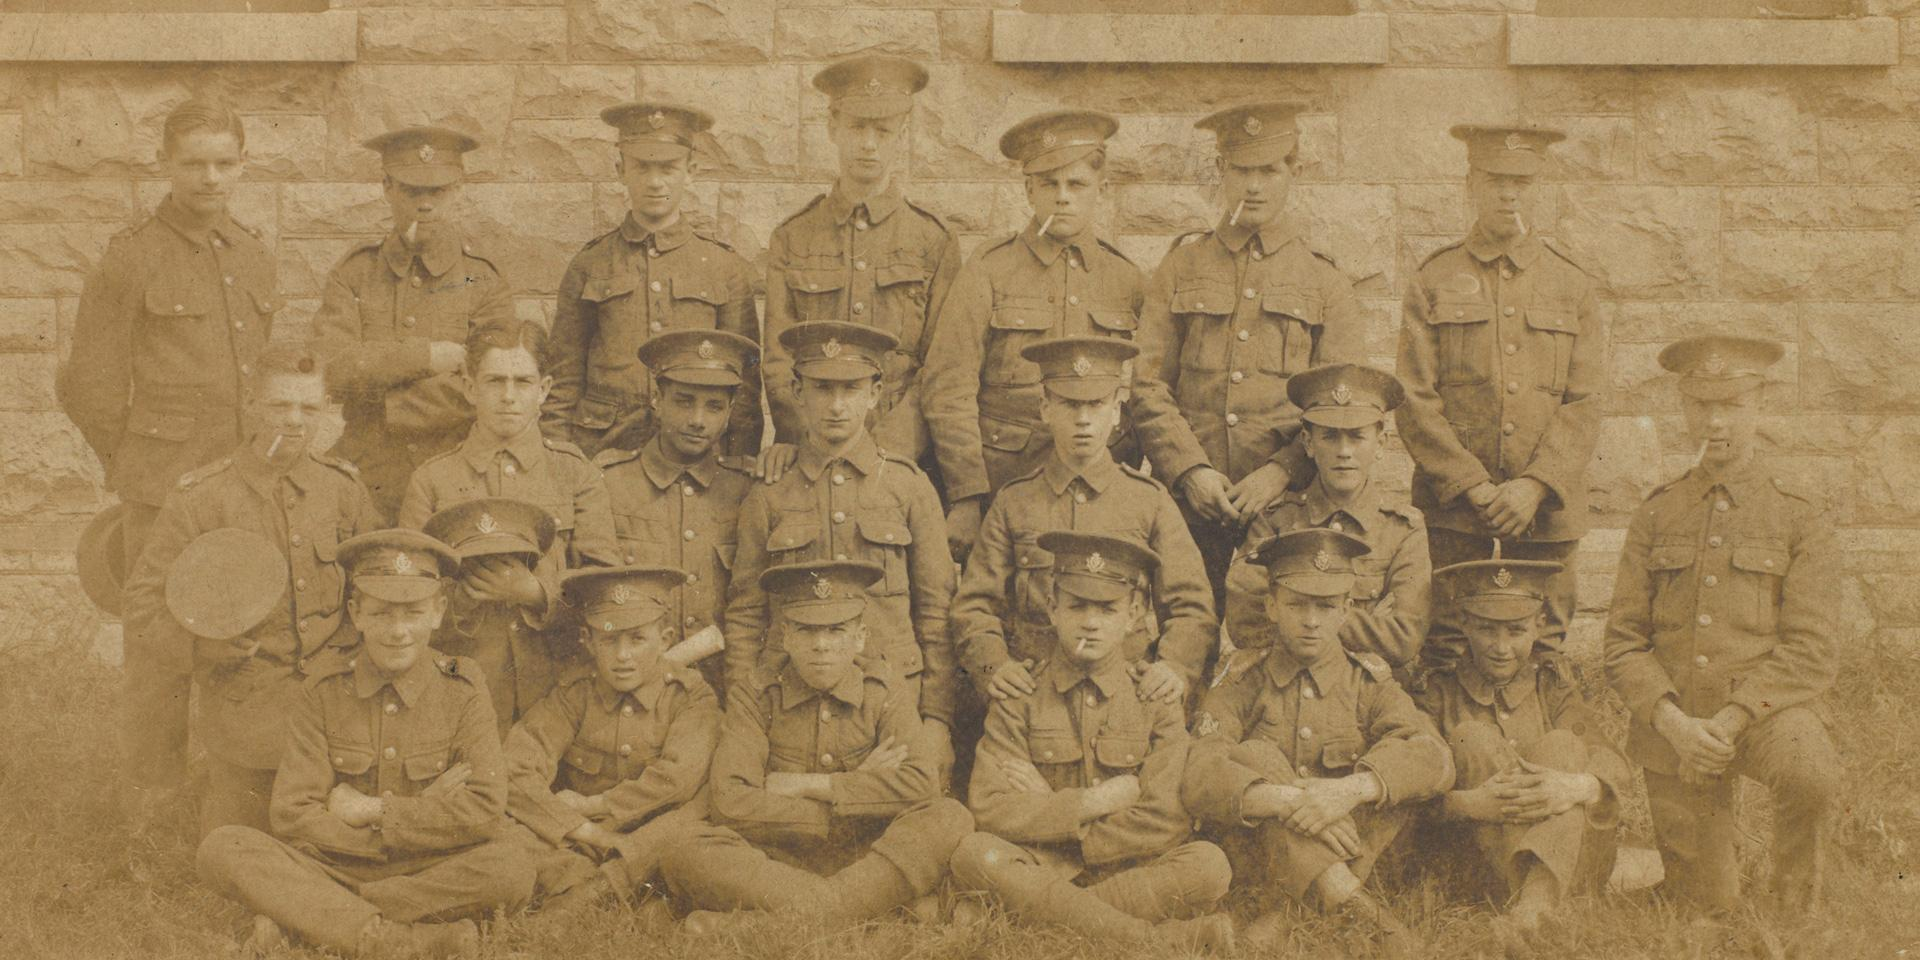 Bandsmen of the 1st Battalion Connaught Rangers, Ireland, 1917